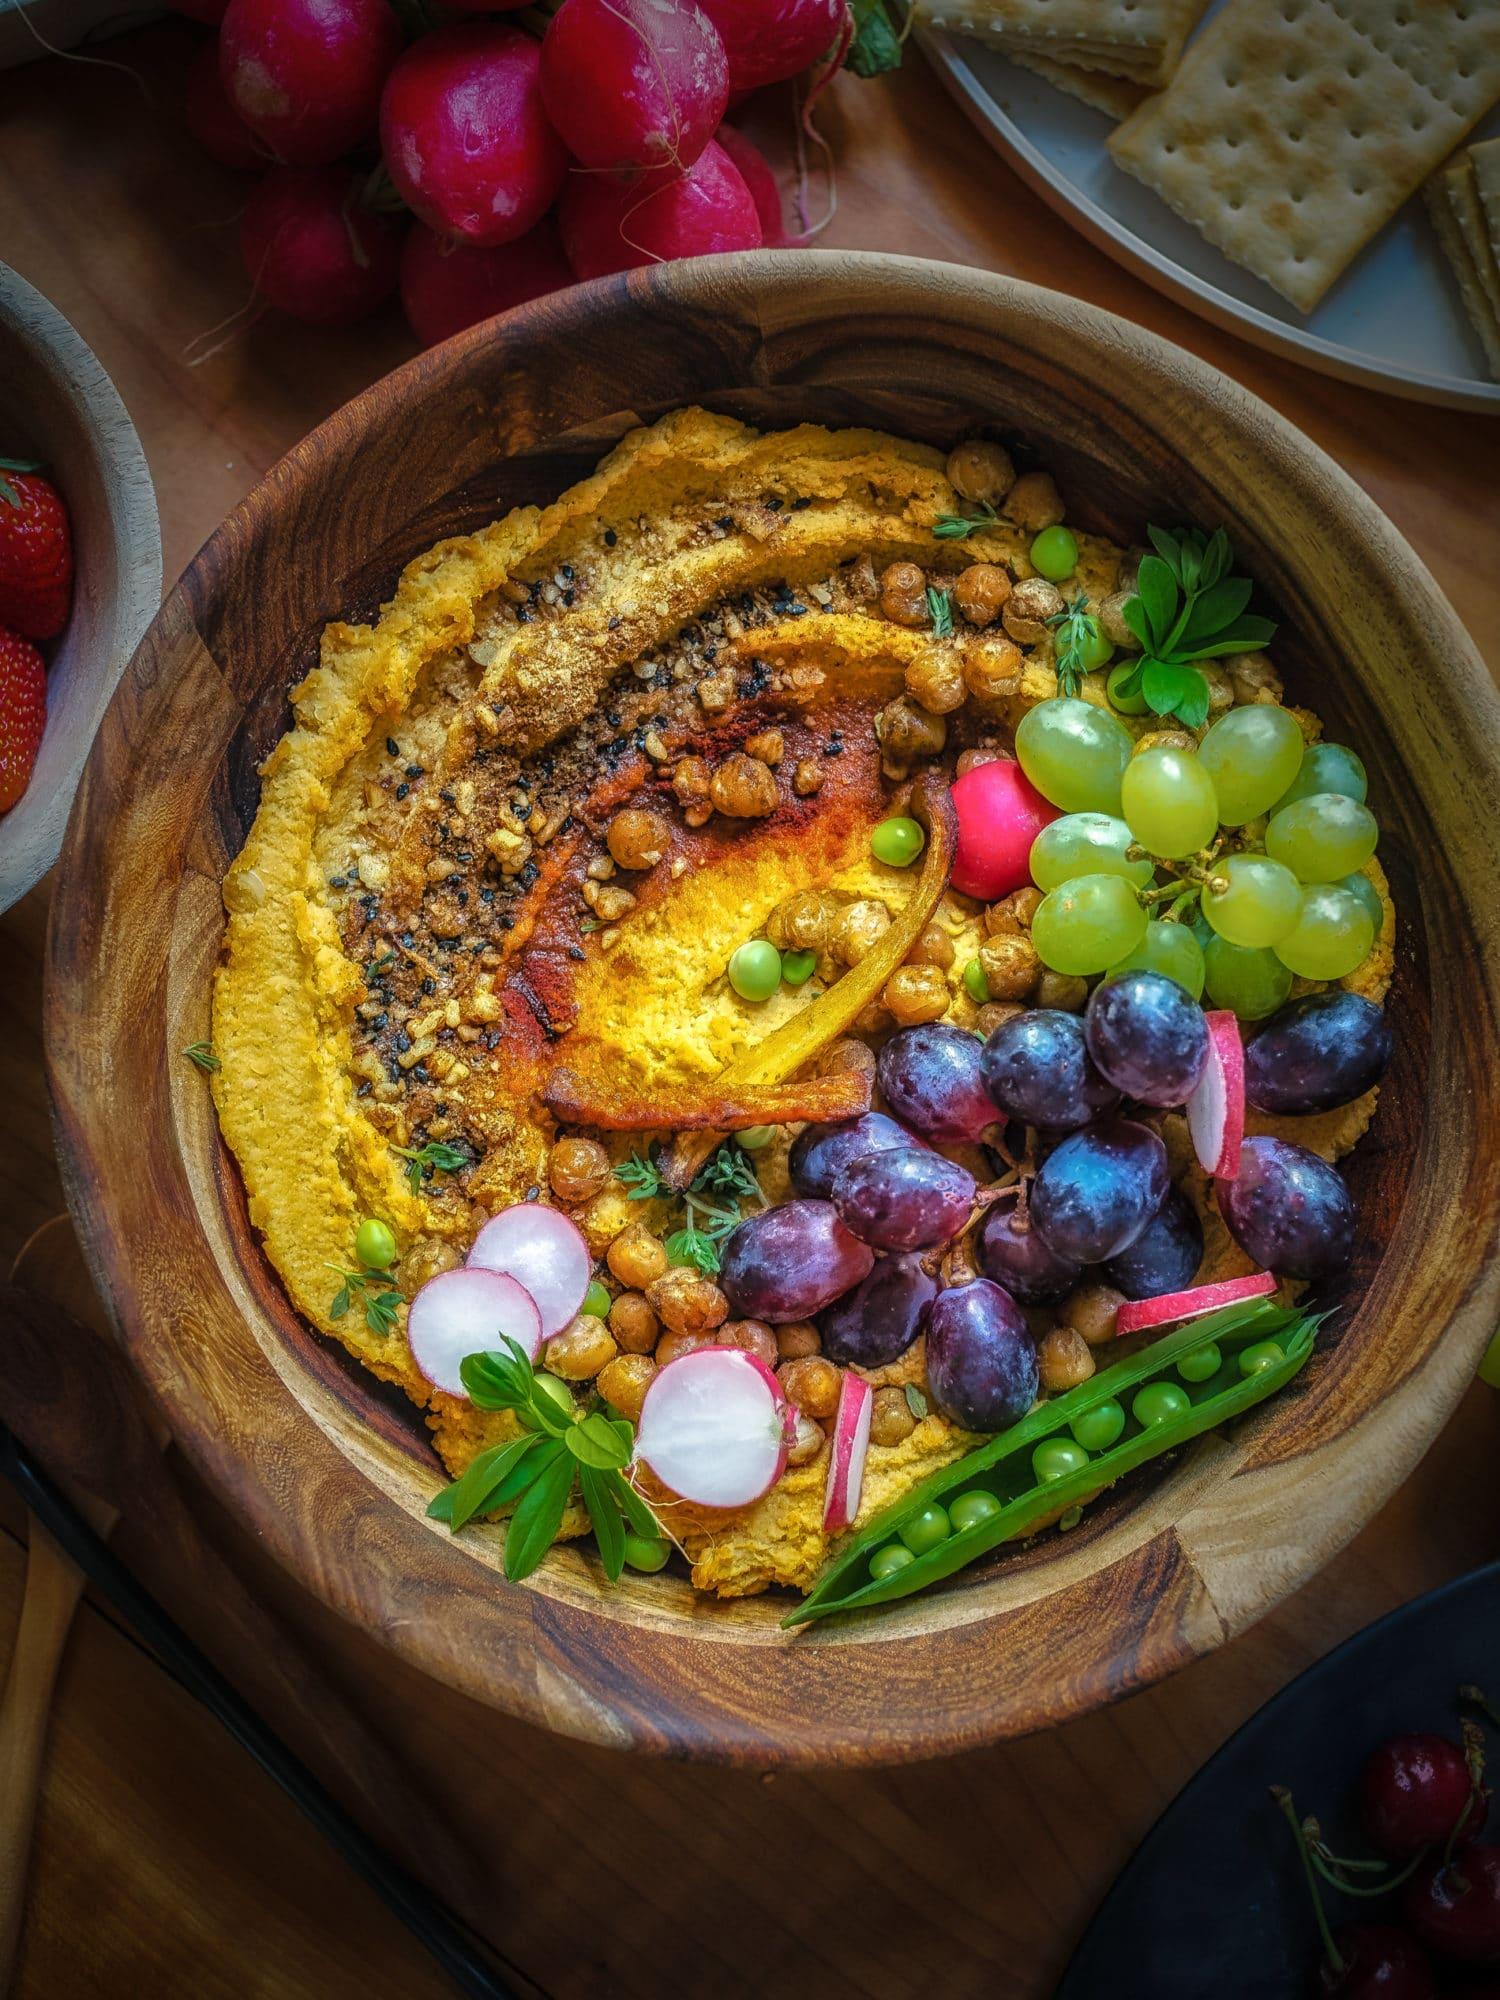 Kürbis Rezept Kürbis Hummus in Schale mit Deko